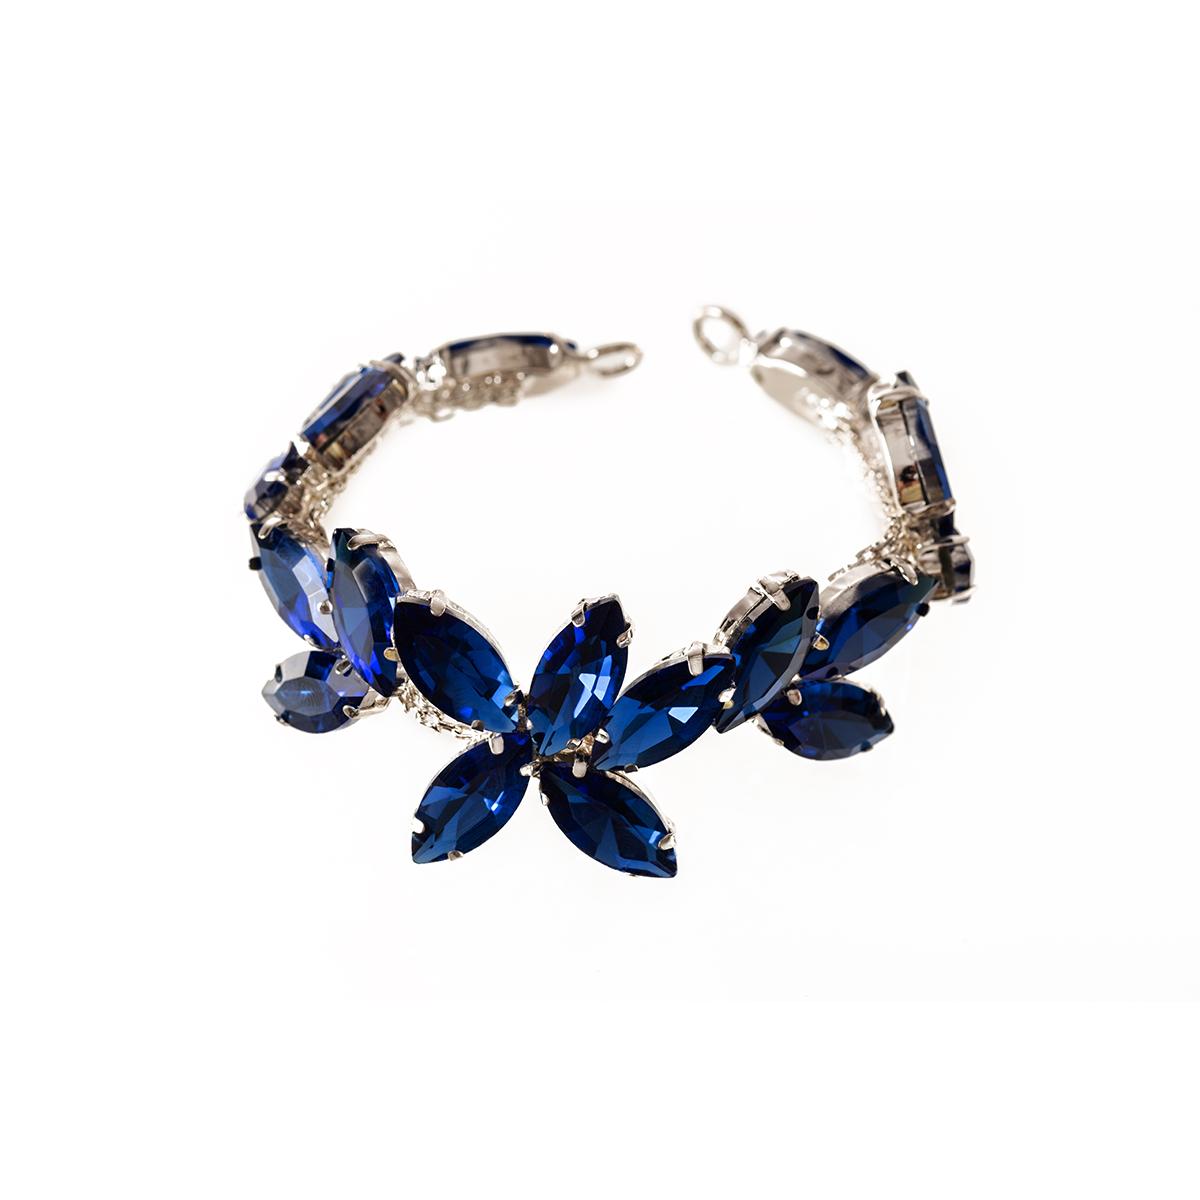 Rhinestone-Diamante-Motif-Applique-Sew-on-Crystal-Patch-for-Wedding-Bridal-Dress thumbnail 28